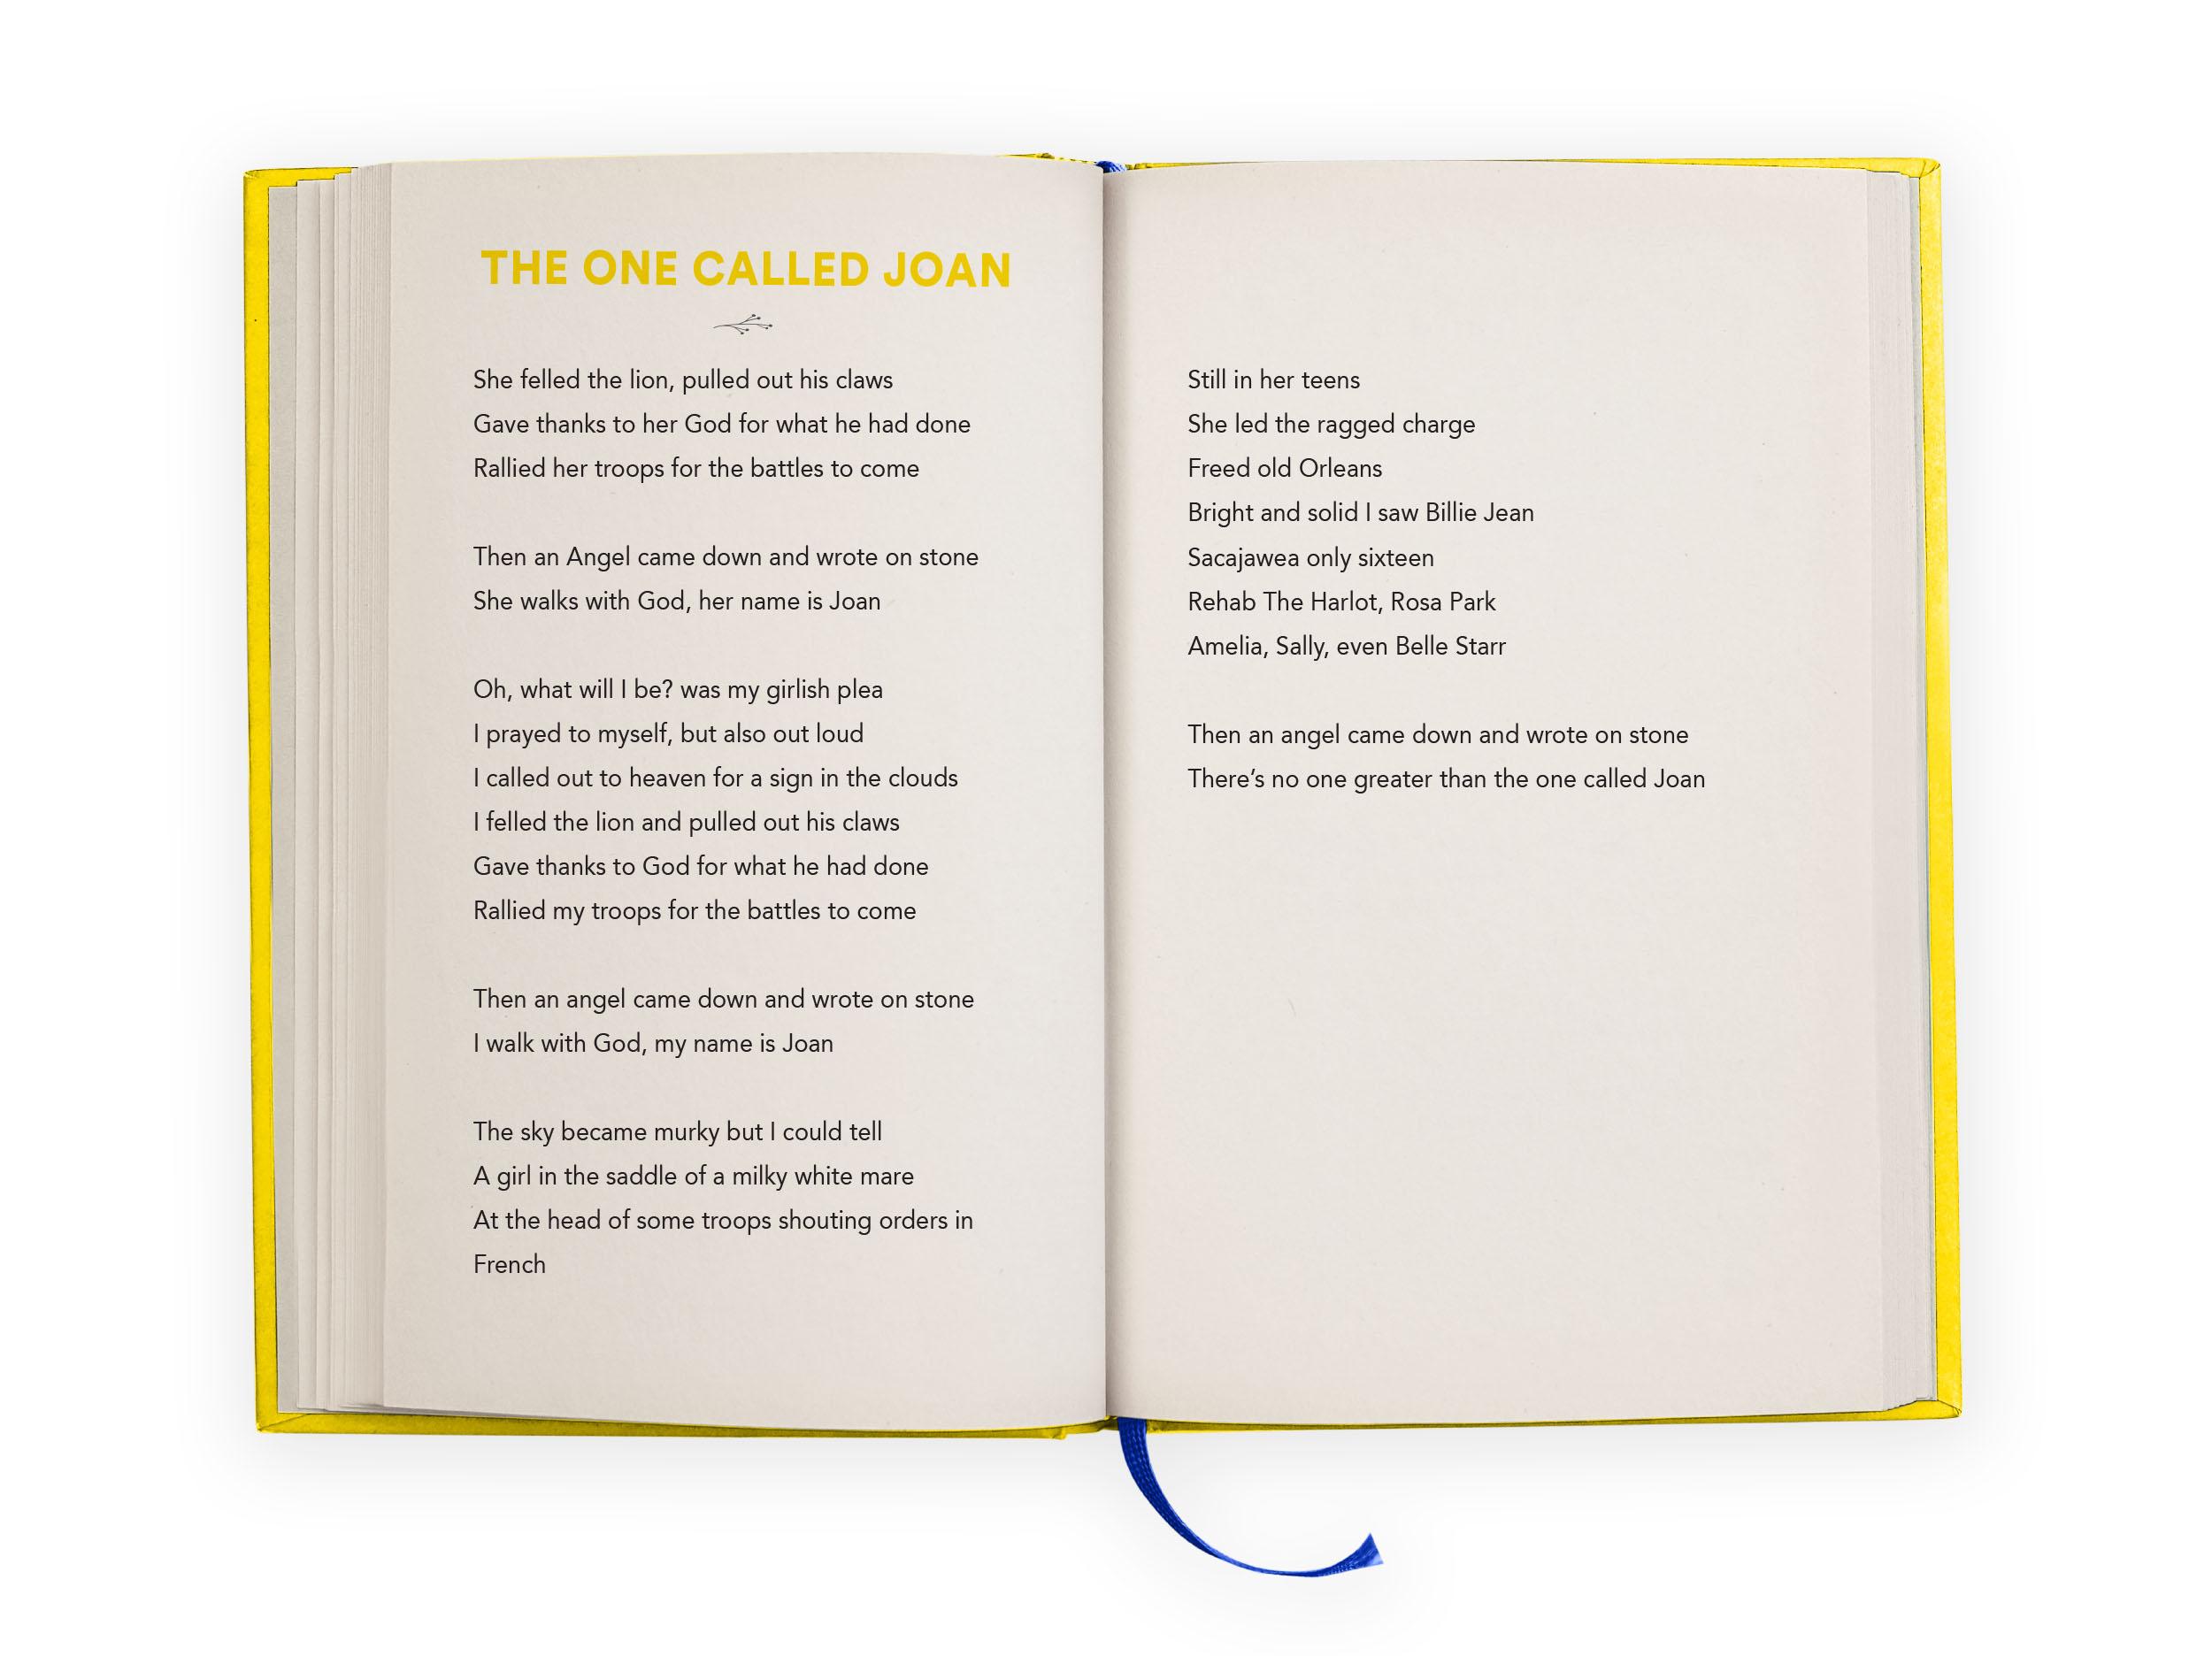 Book_3_TheOneCalledJoan.jpg